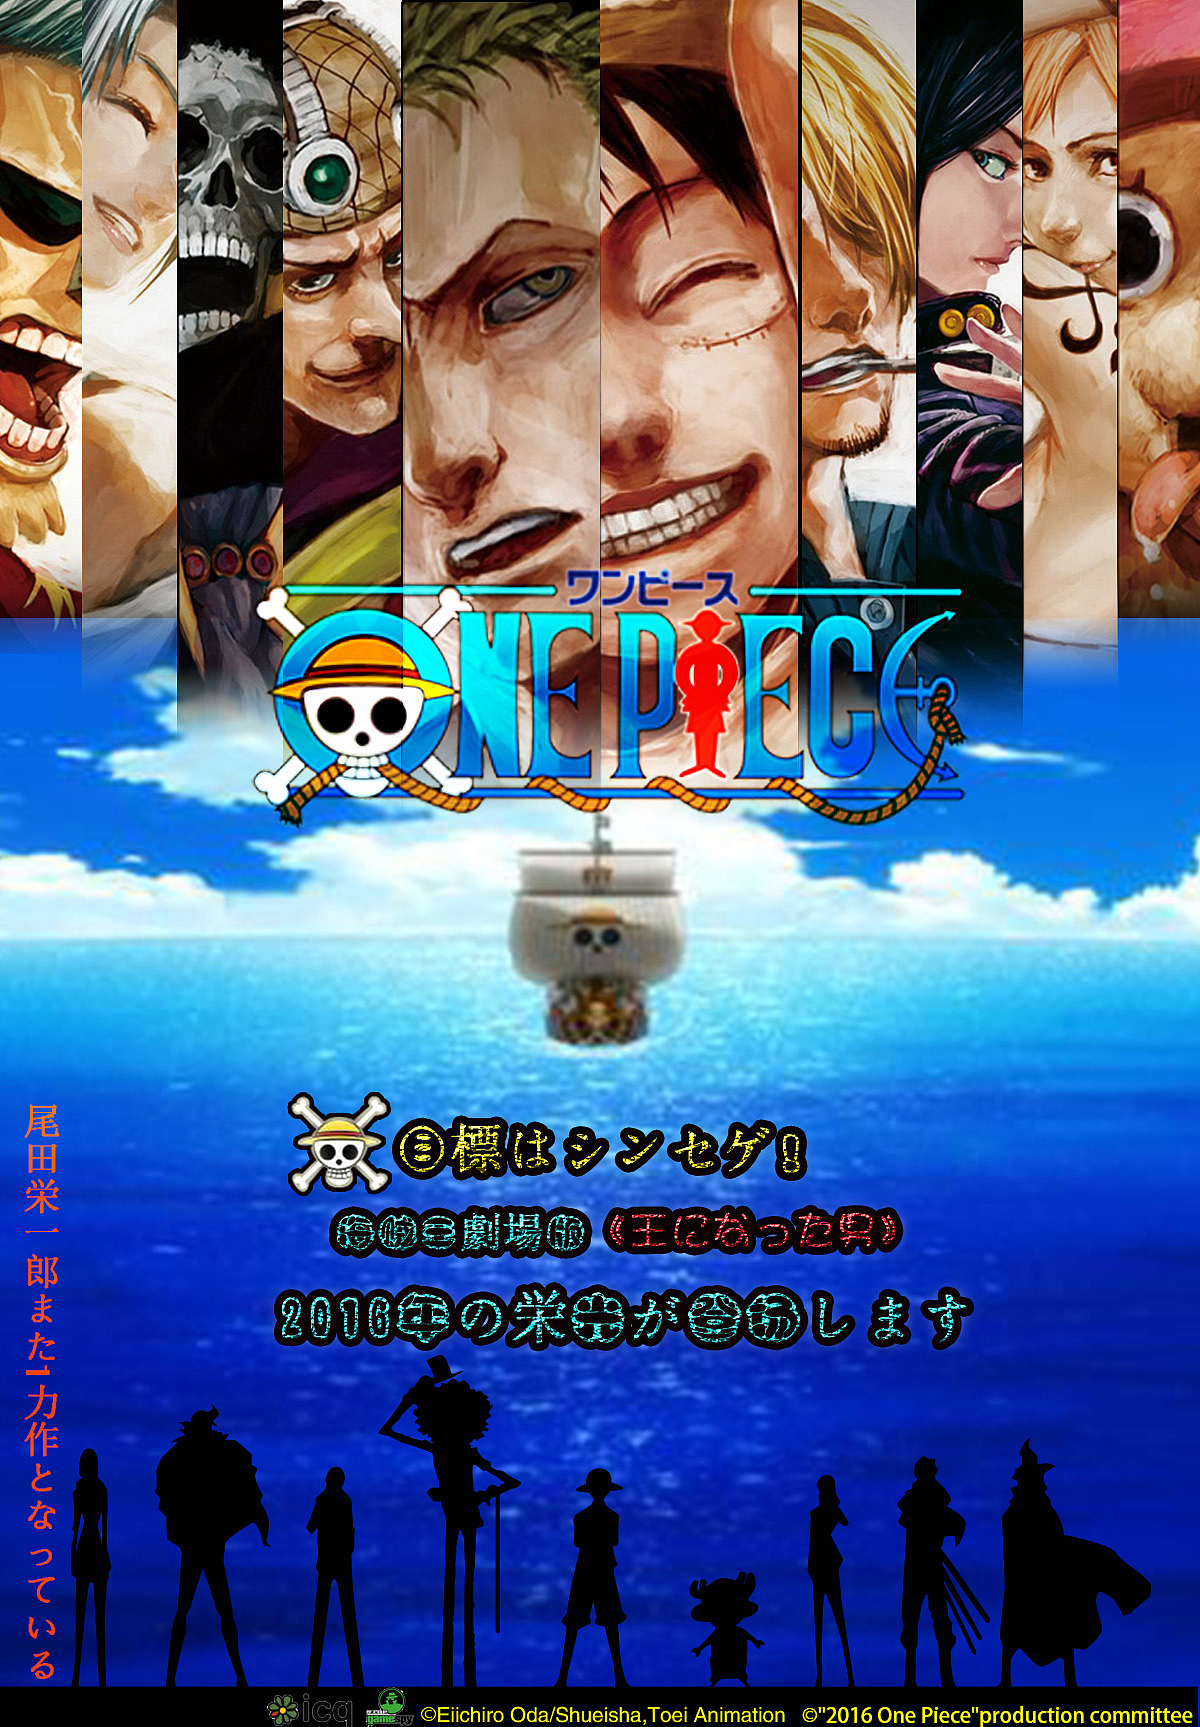 ps设计大赛海报_海贼王海报设计|平面|宣传品|liyi384255339 - 原创作品 - 站酷 (ZCOOL)